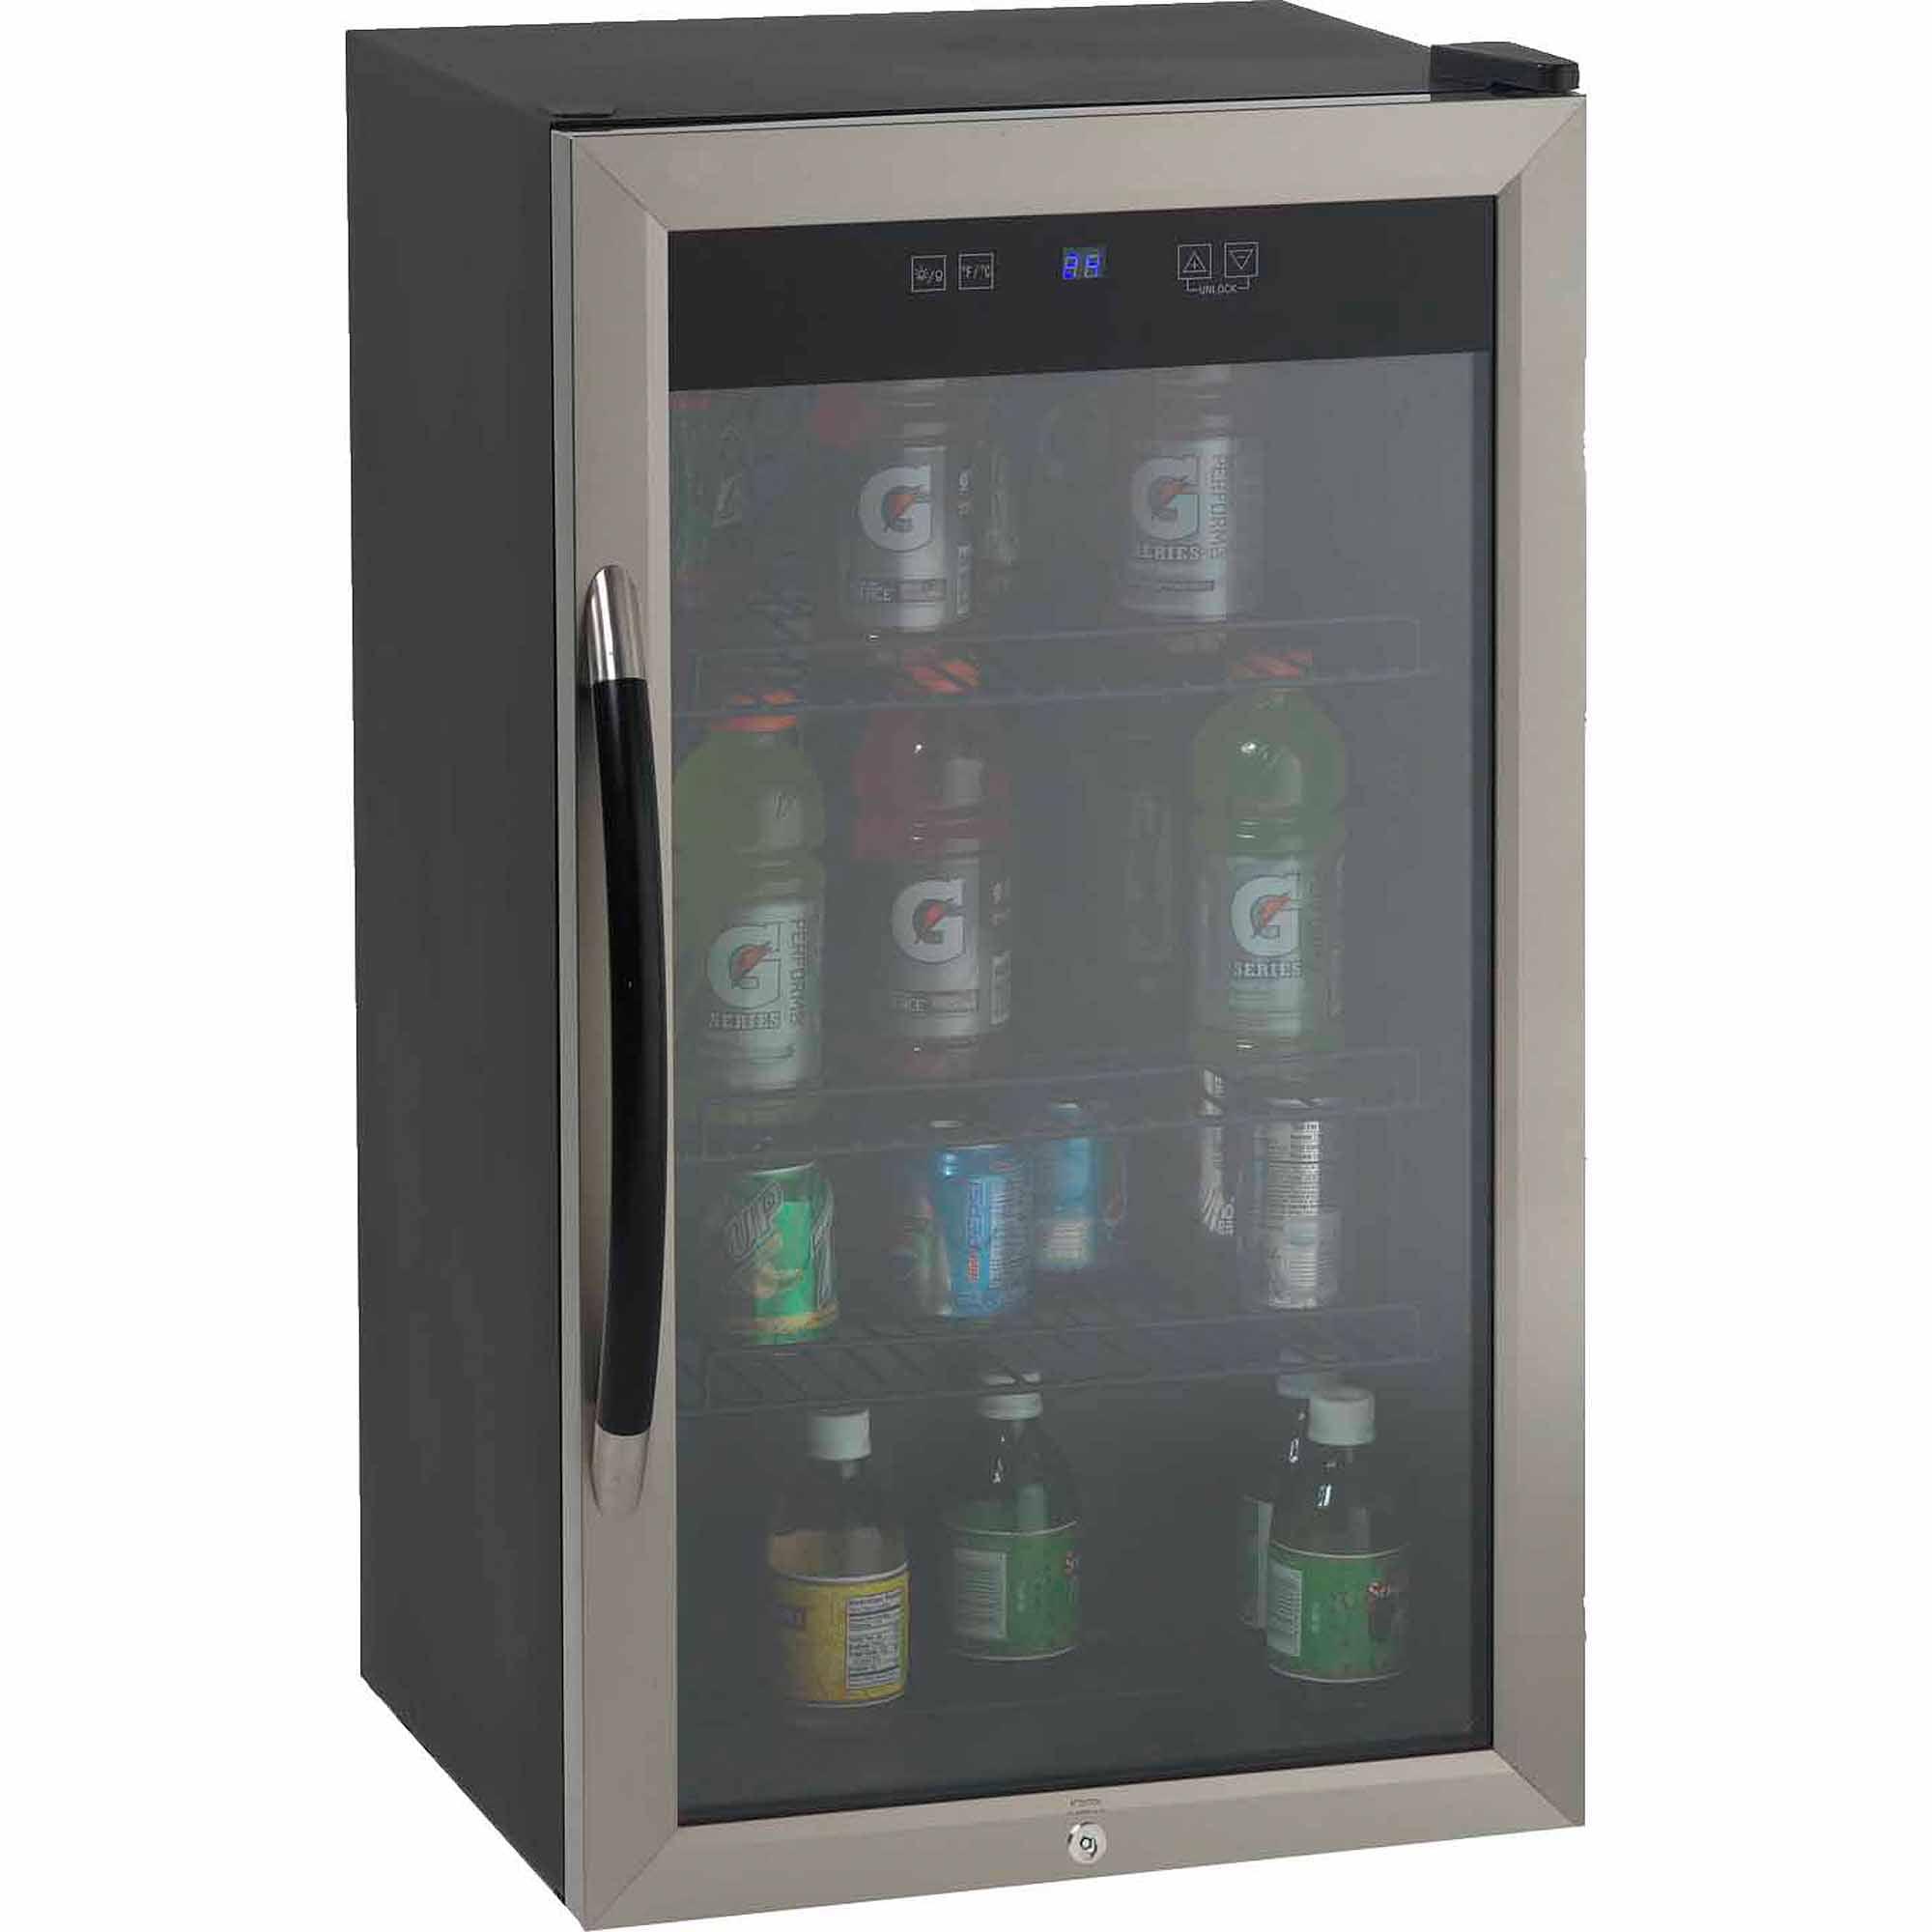 Avanti Showcase Beverage Cooler with Stainless Steel Door Frame and Dual-Pane Glass Door